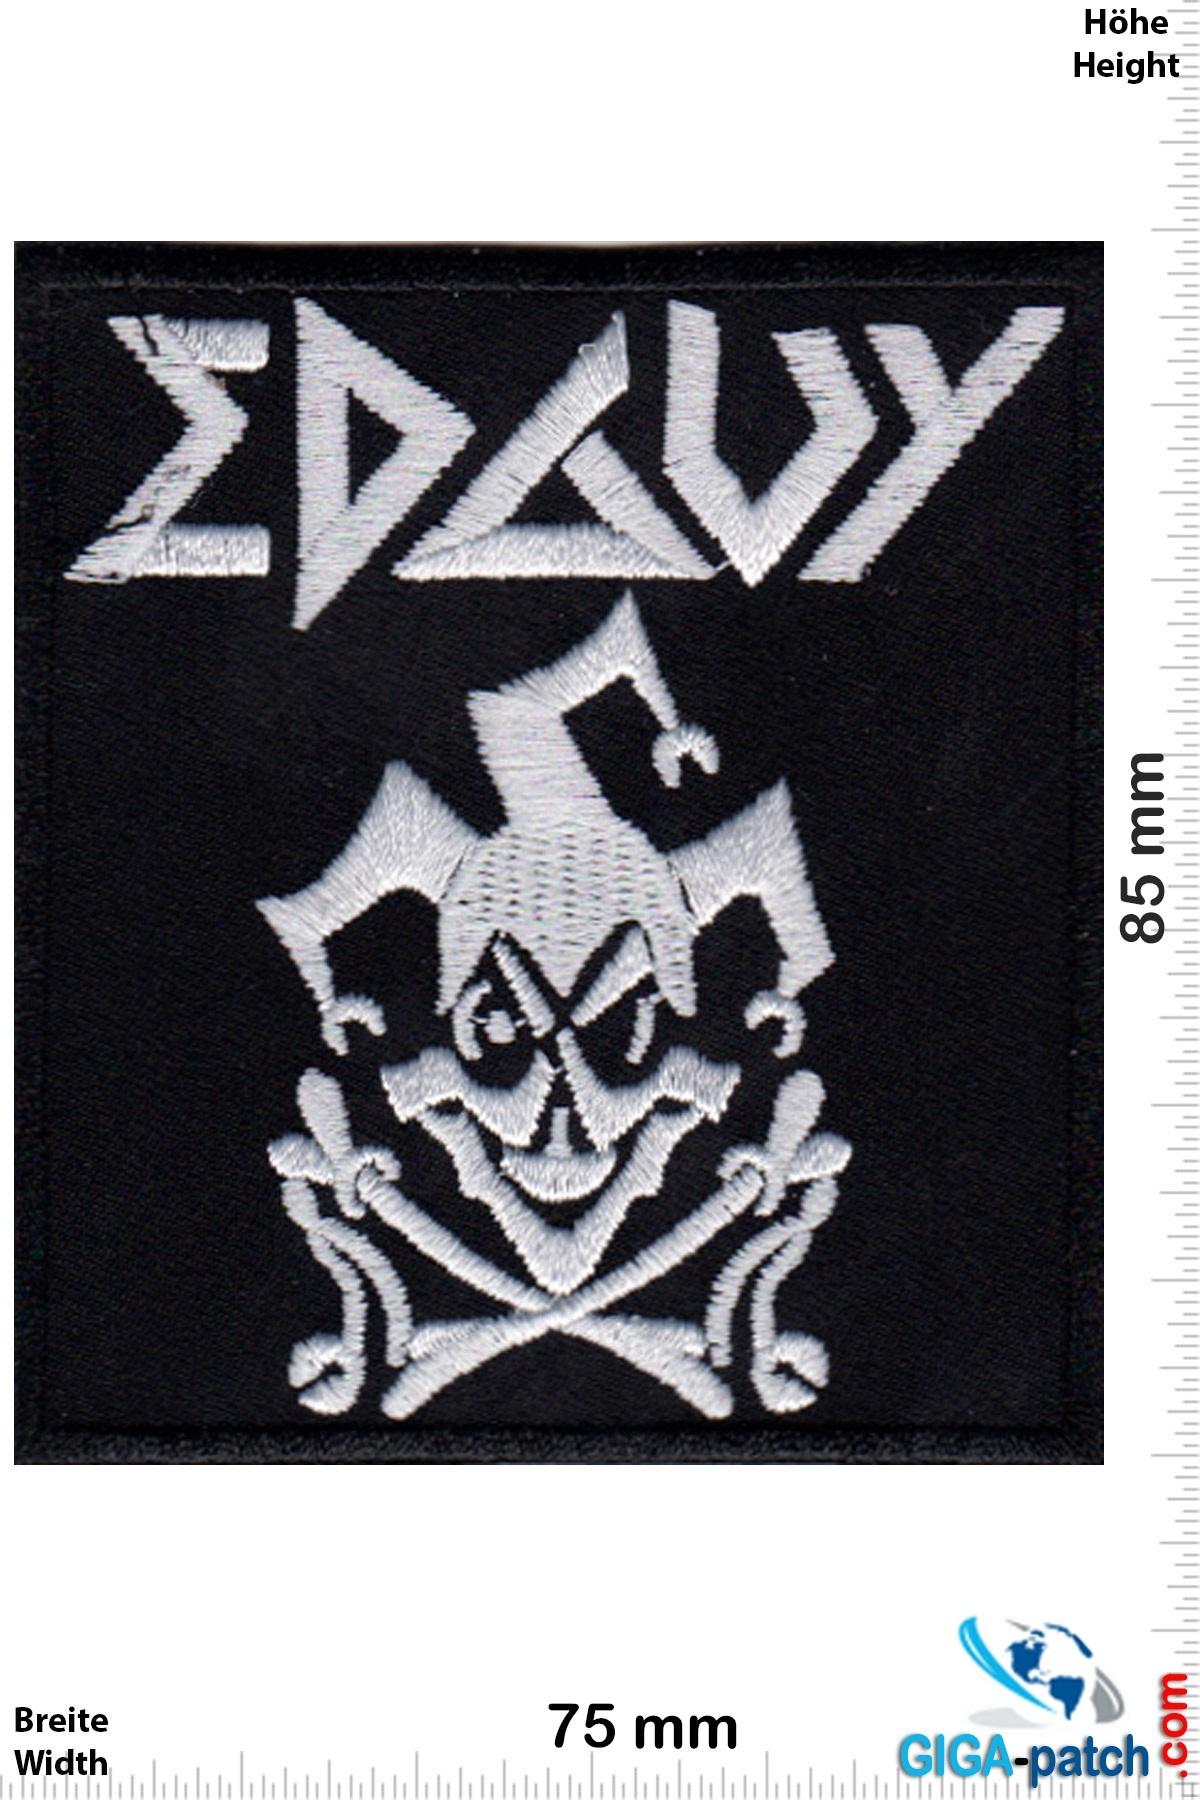 Edguy Edguy -Age of the Joker - Power-Metal-Band